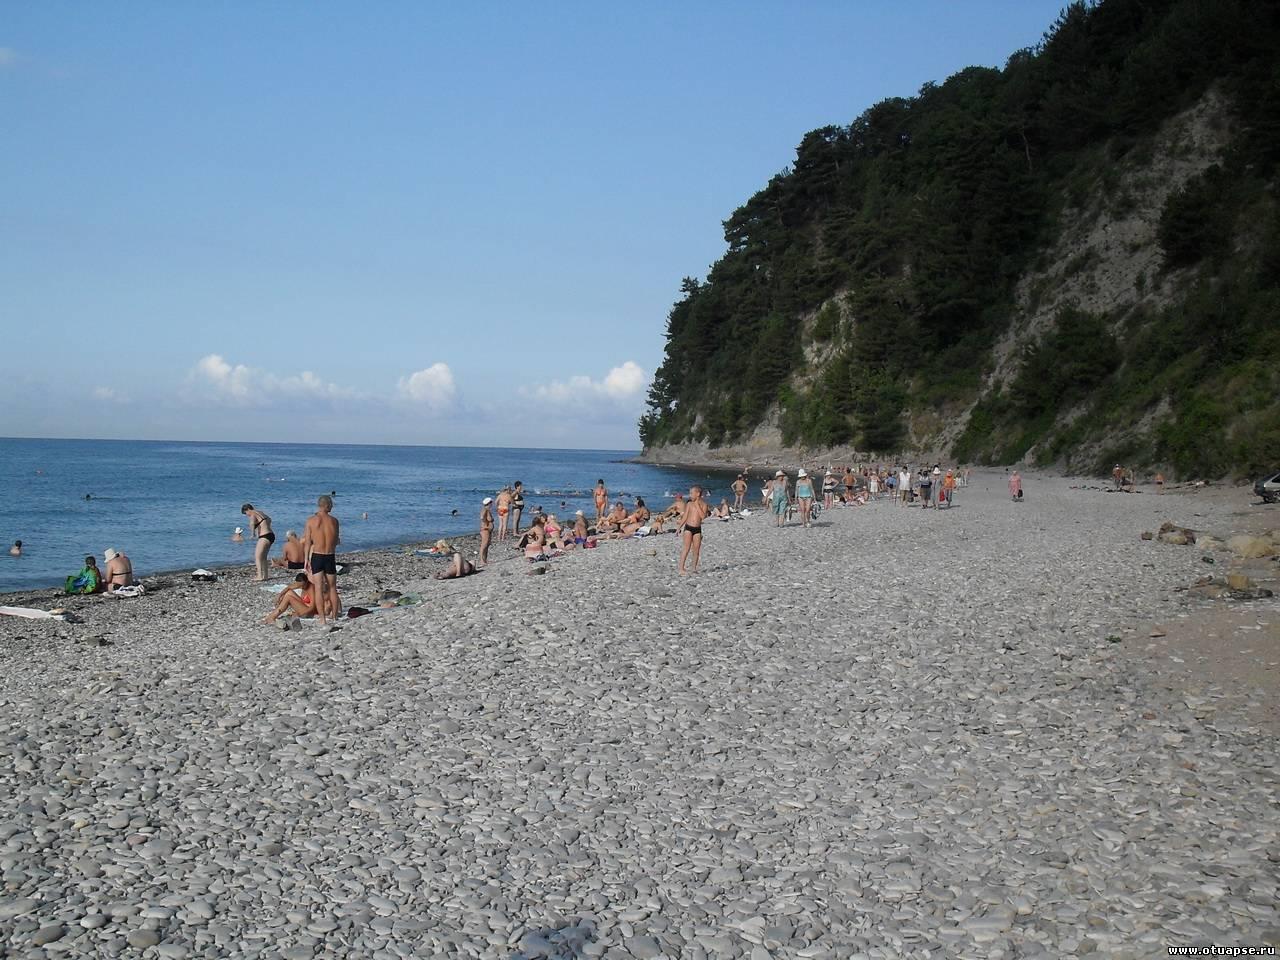 Нудистский пляж Туапсе Туапсе Россия  Мировед